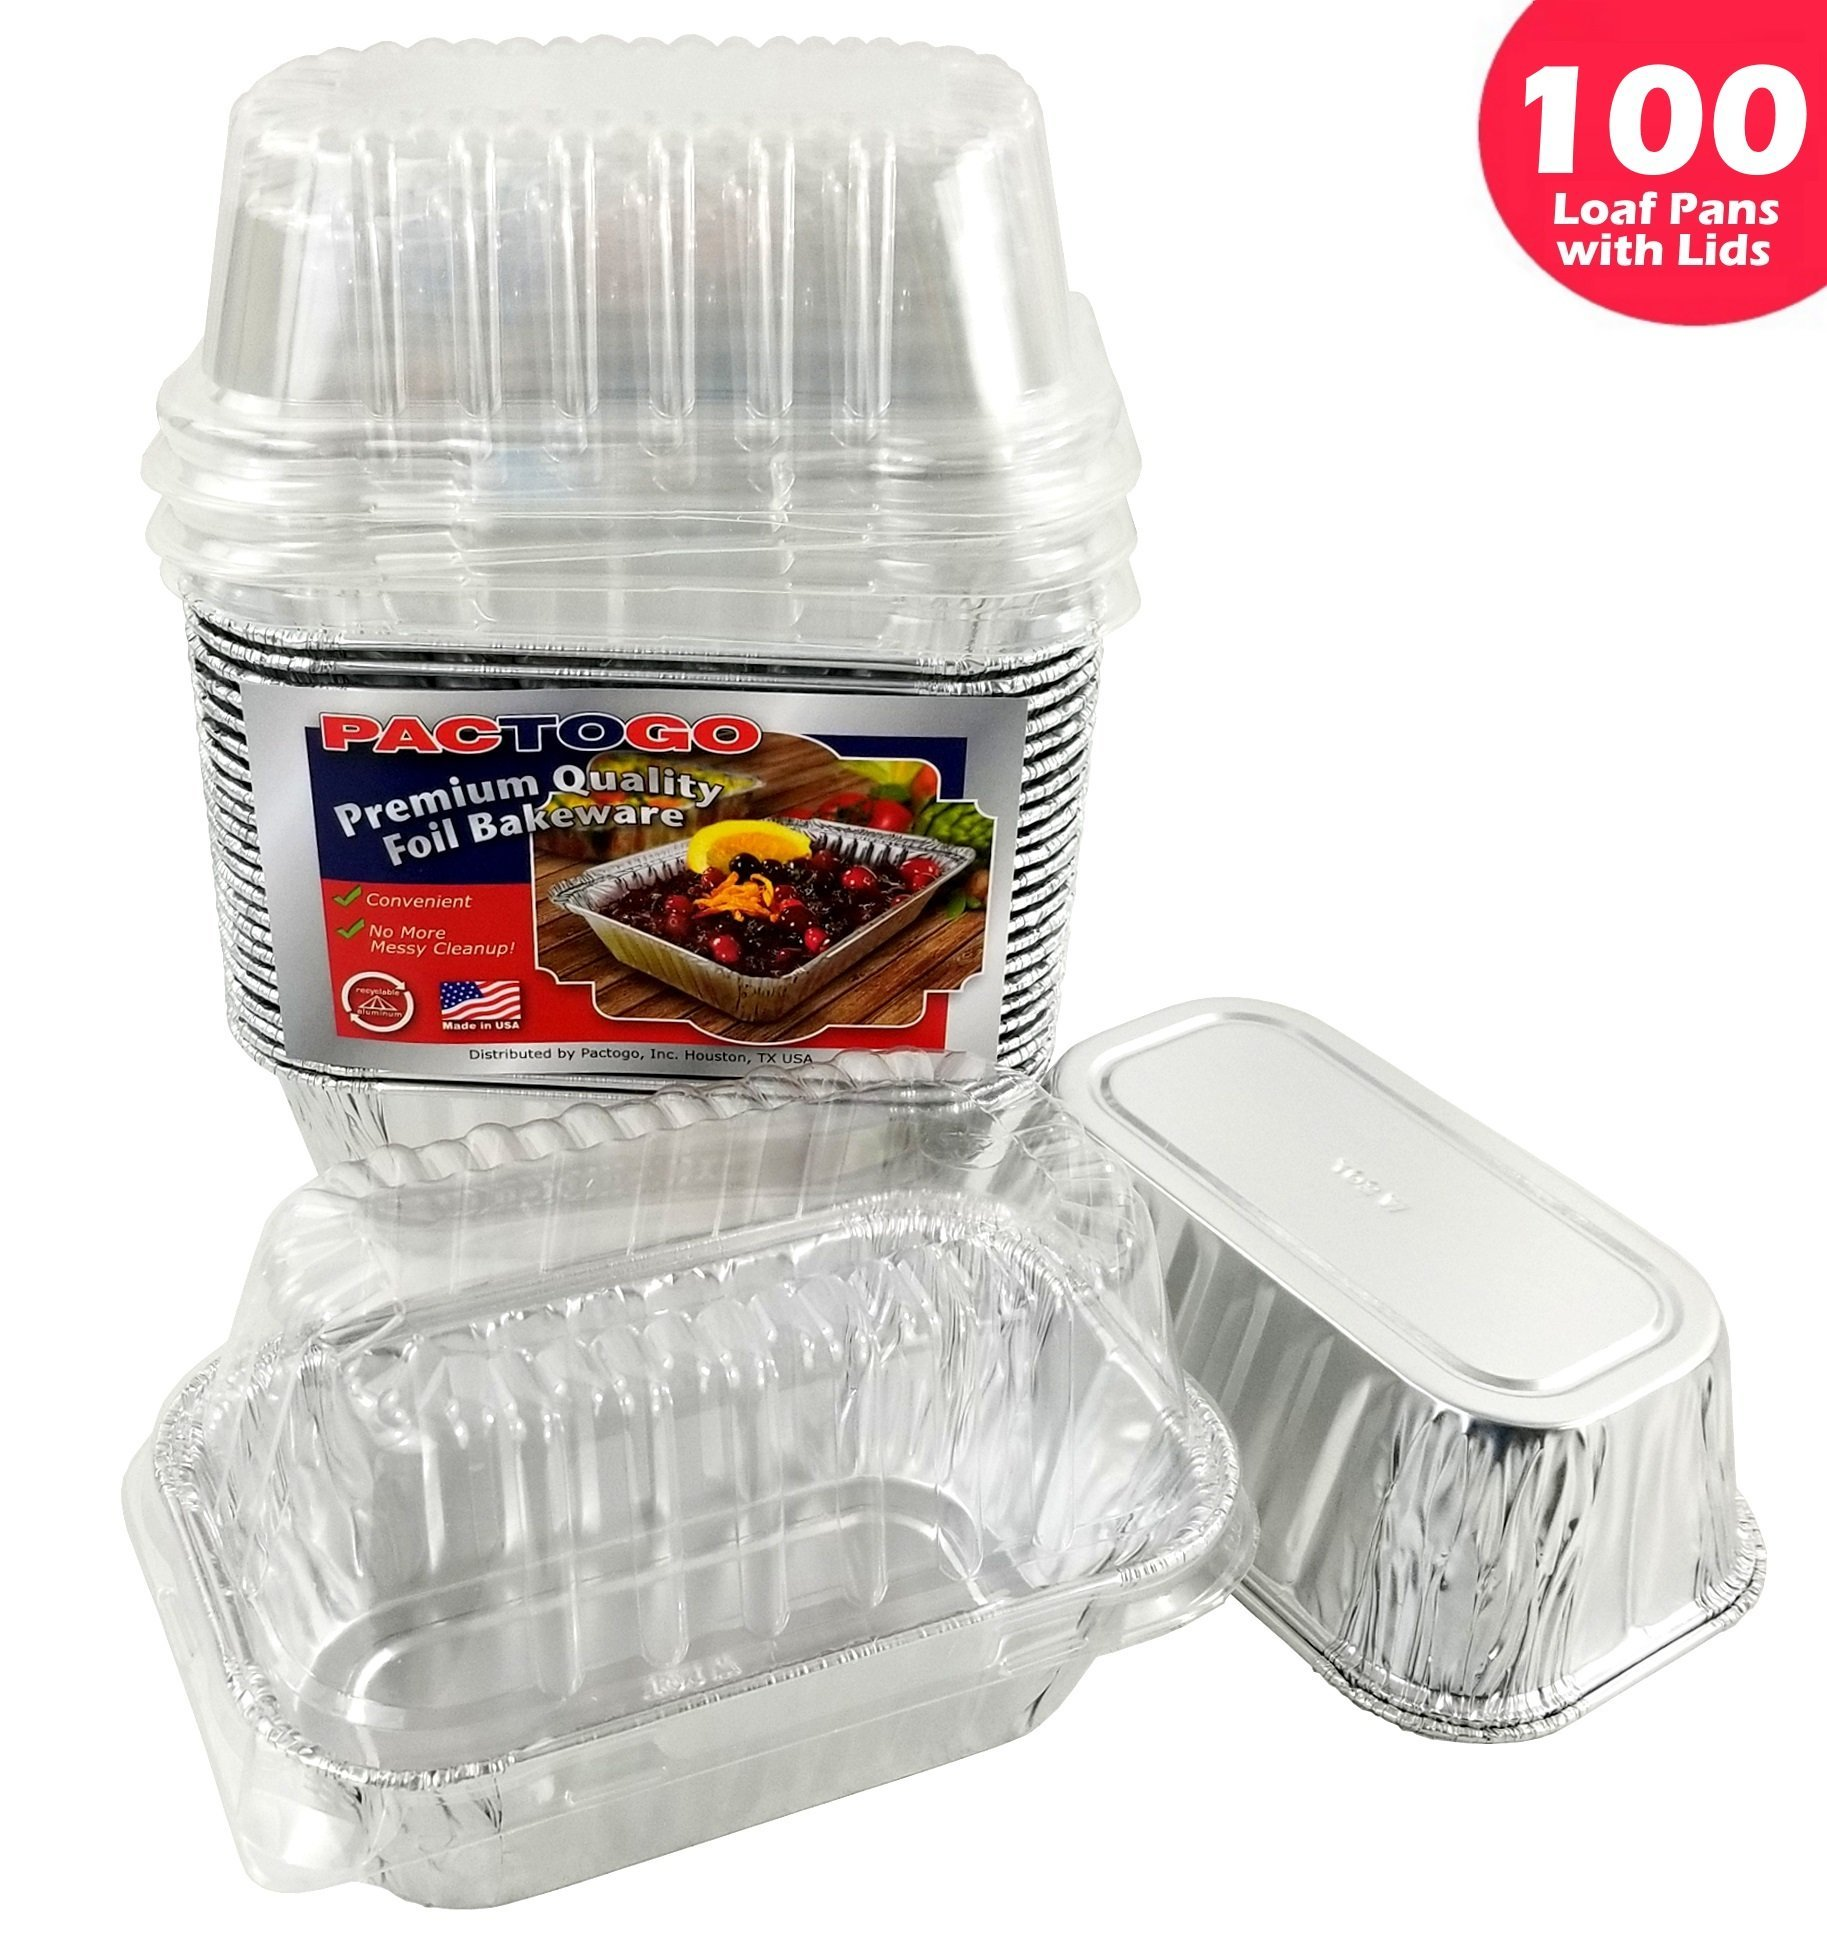 Pactogo Disposable 1 lb. Aluminum Foil Mini Loaf Pans with Clear Dome Lids (Pack of 100 Sets)